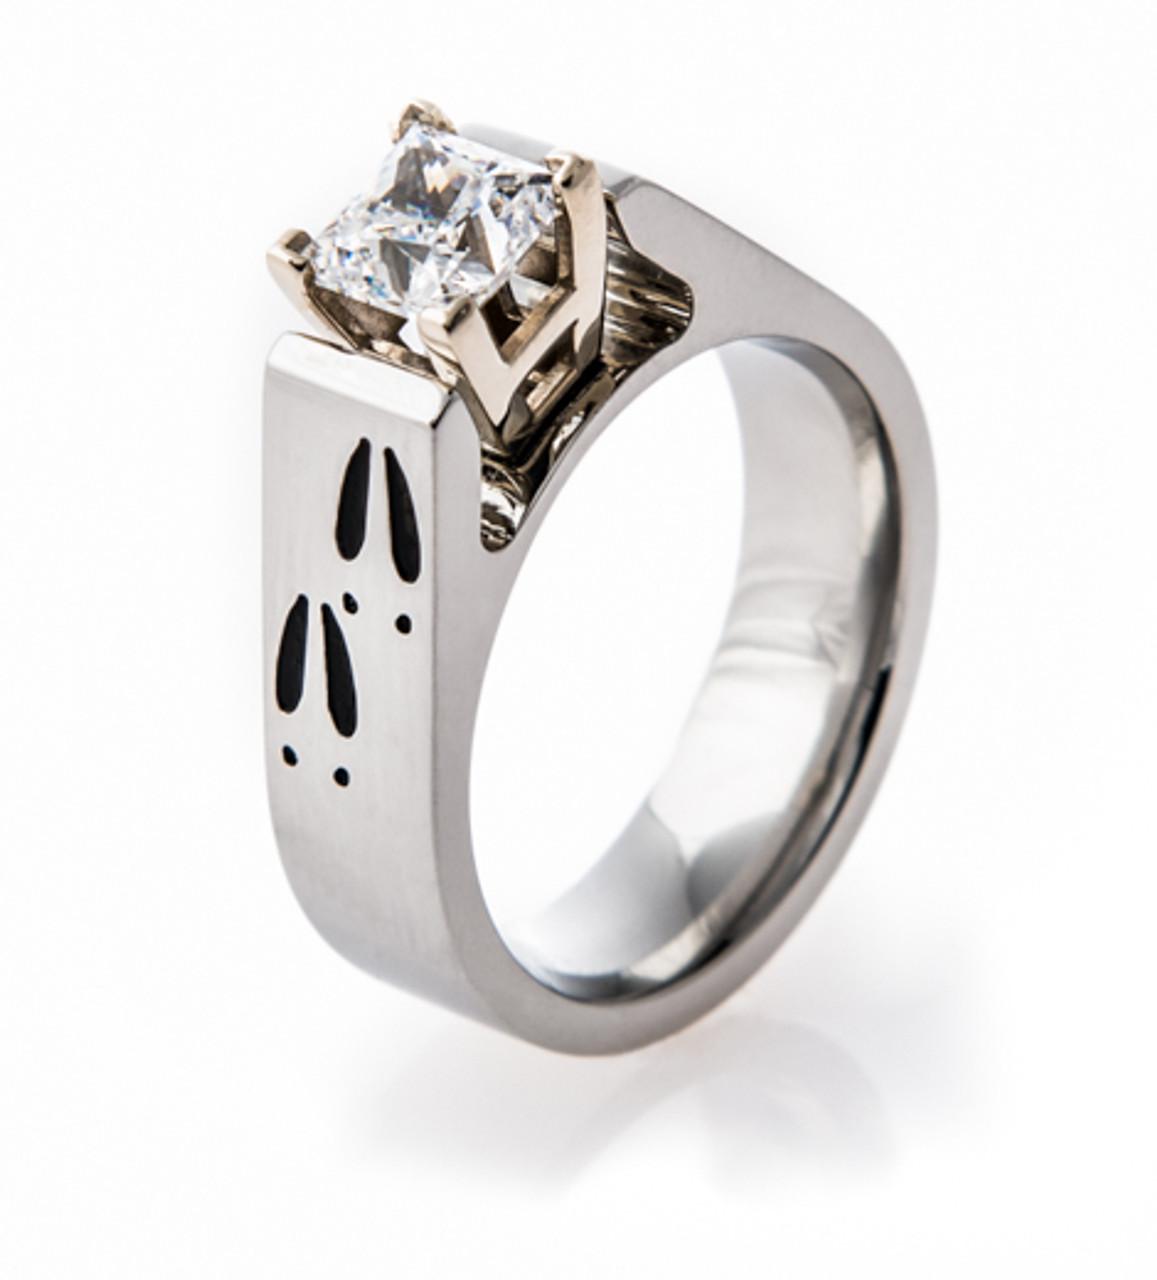 Cobalt Chrome Deer Track Engagement Ring TitaniumBuzz